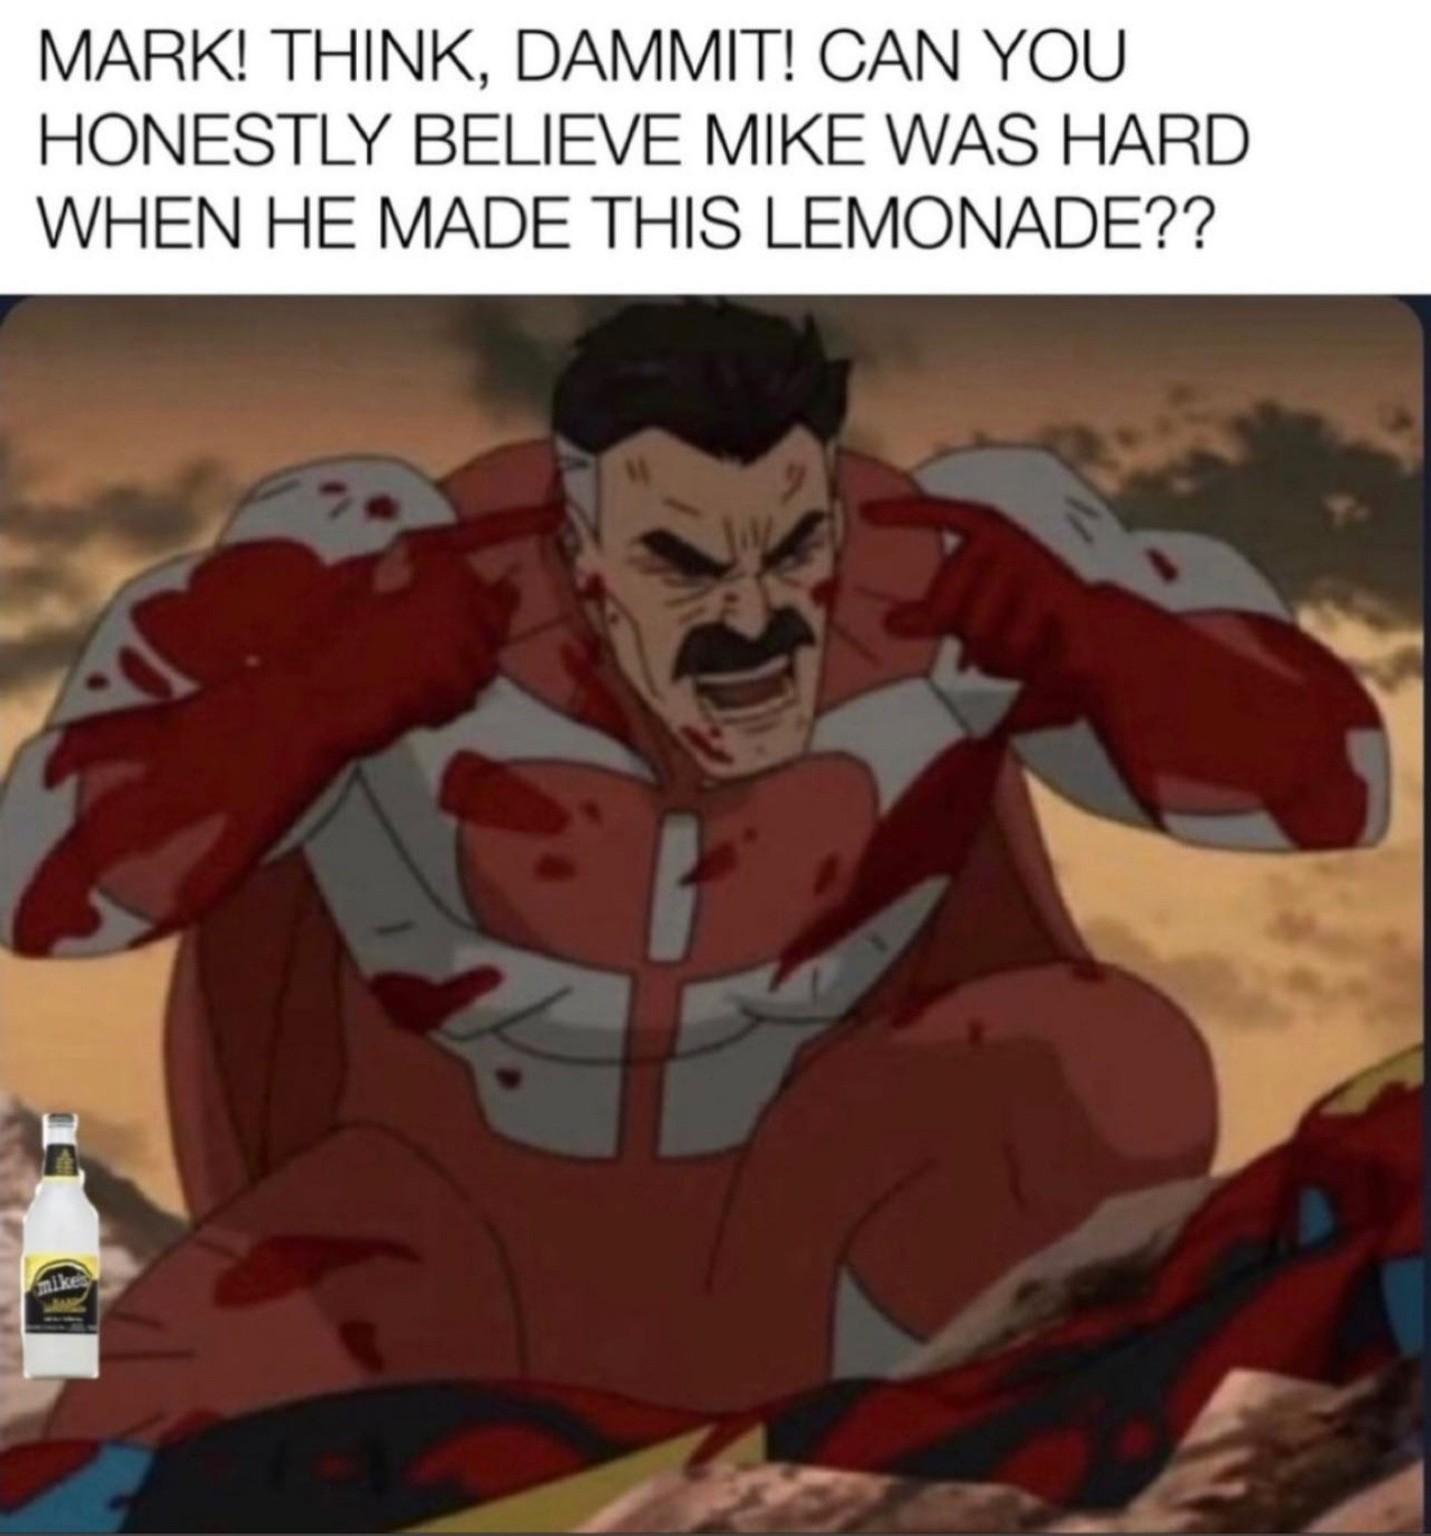 Hope he was - meme